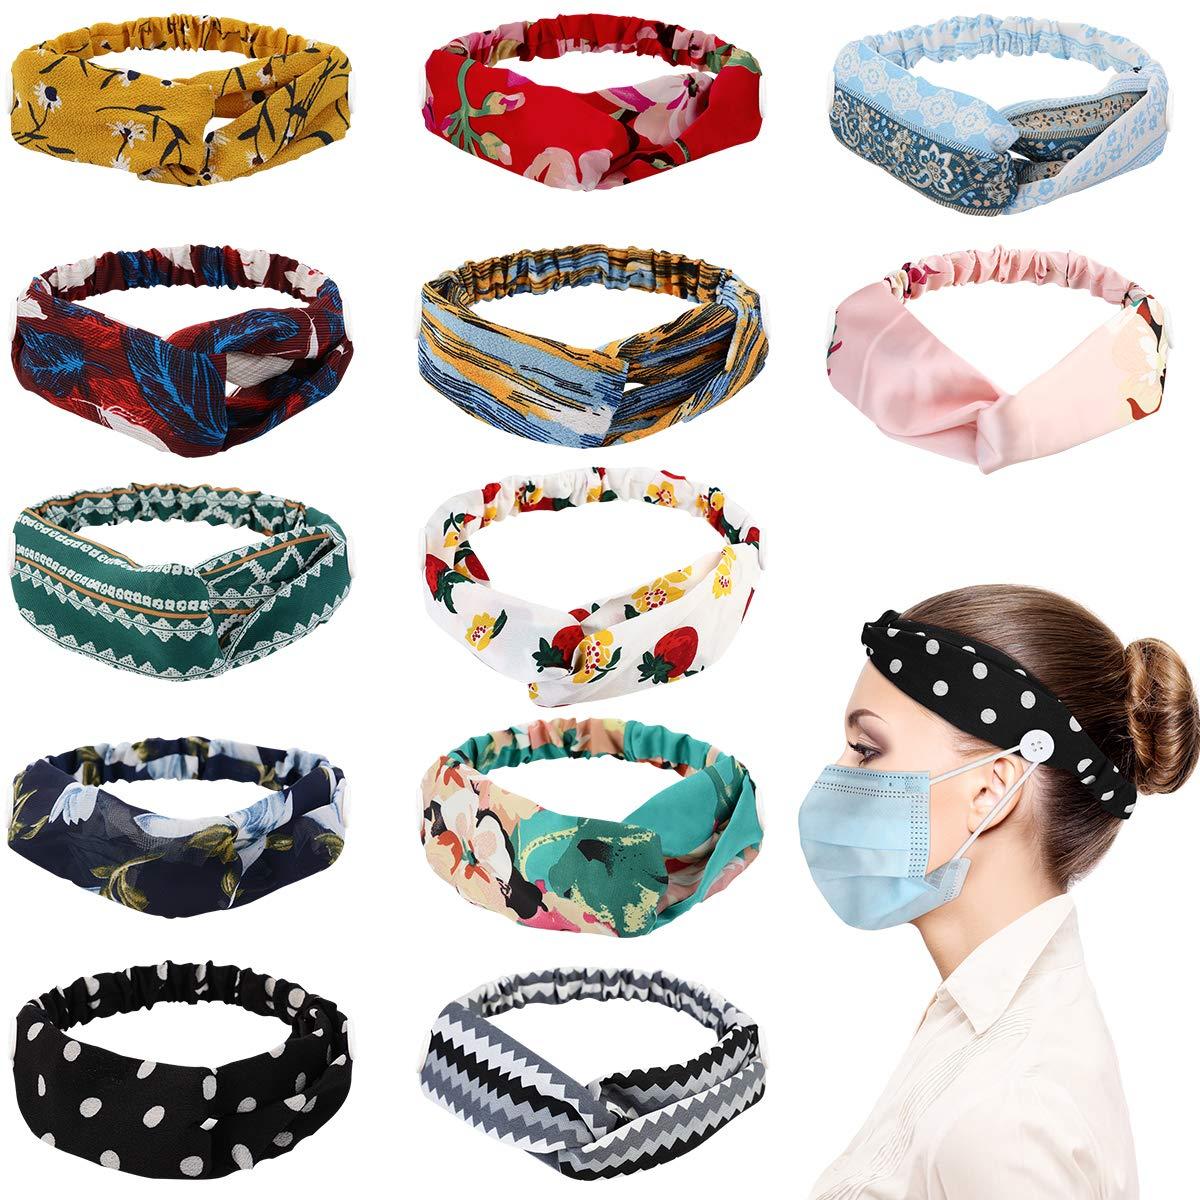 Button Headbands for Women, Kapmore 12PCS Elastic Print Headbands with Button Vintage Floral Bandeau Headbands Criss Cross Hair Wrap Hair Accessories